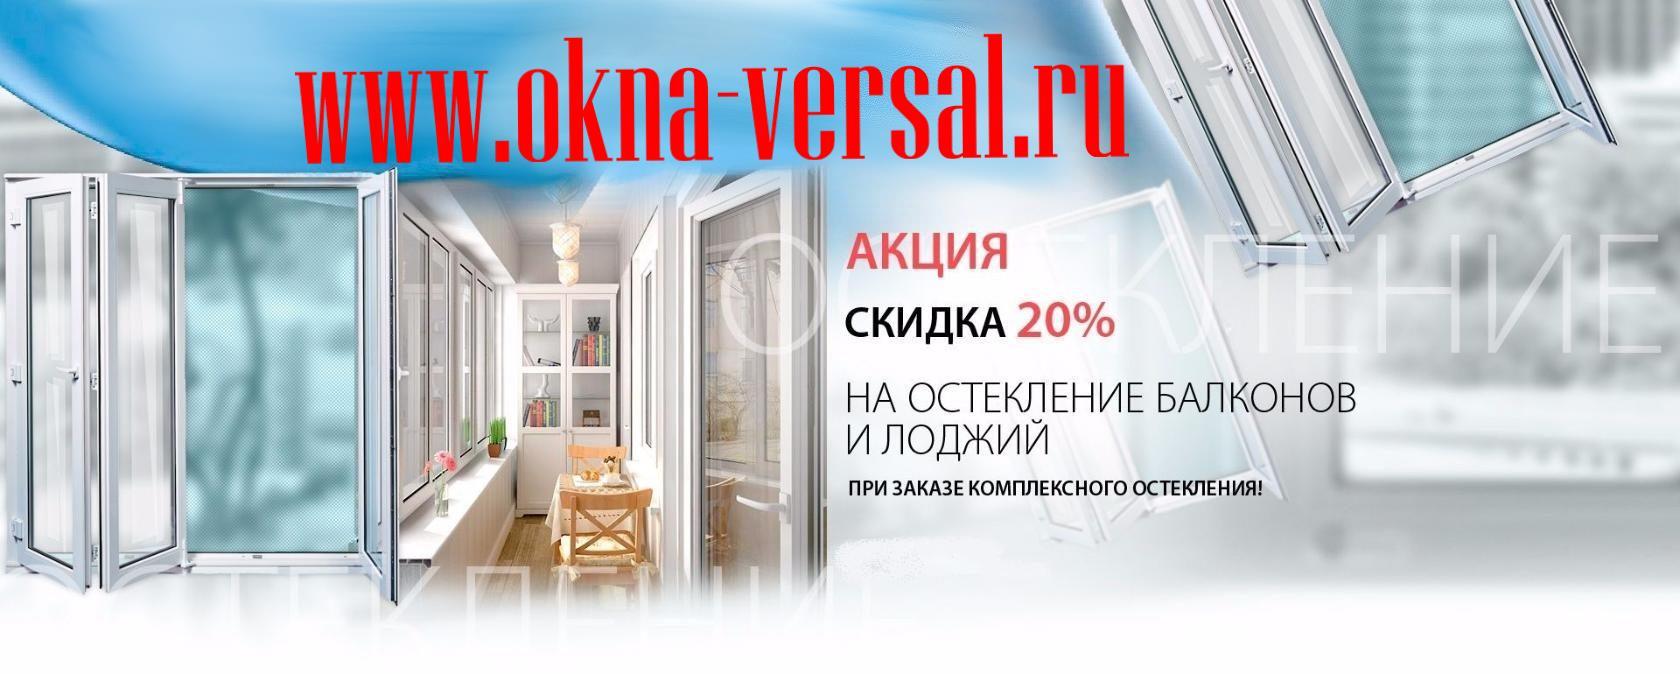 https://www.okna-versal.ru/